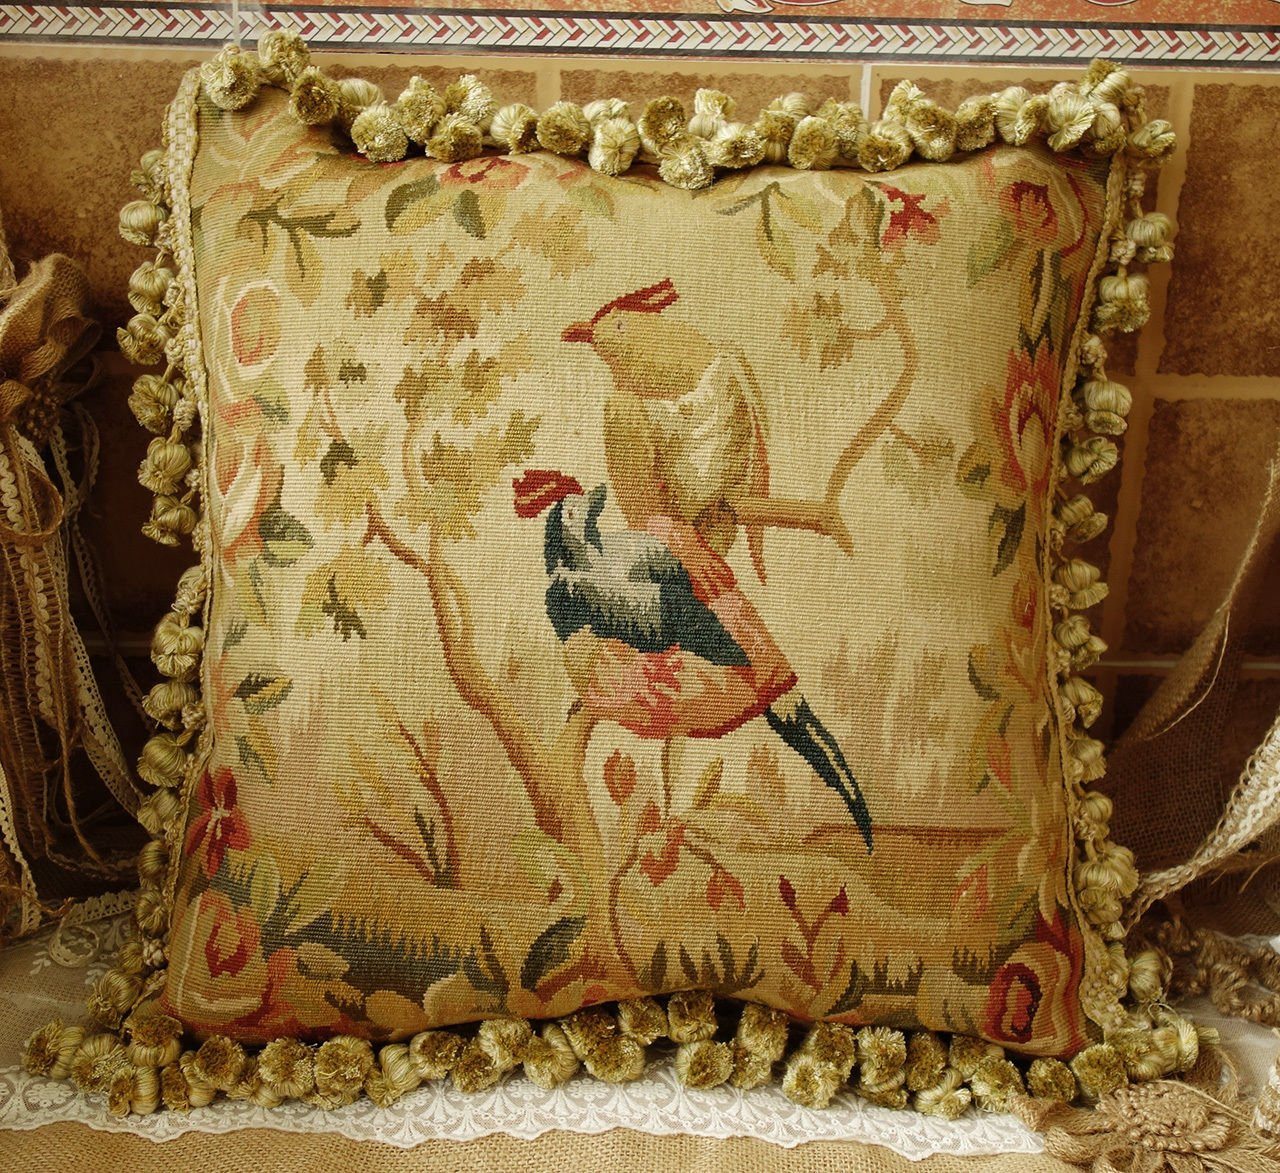 Fine Home Crafts 18インチ ヴィンテージ Aubusson 枕カバー 18世紀 アンティークレプリカ 家宝 宝物 鳥 #A   B07R6K2YVV